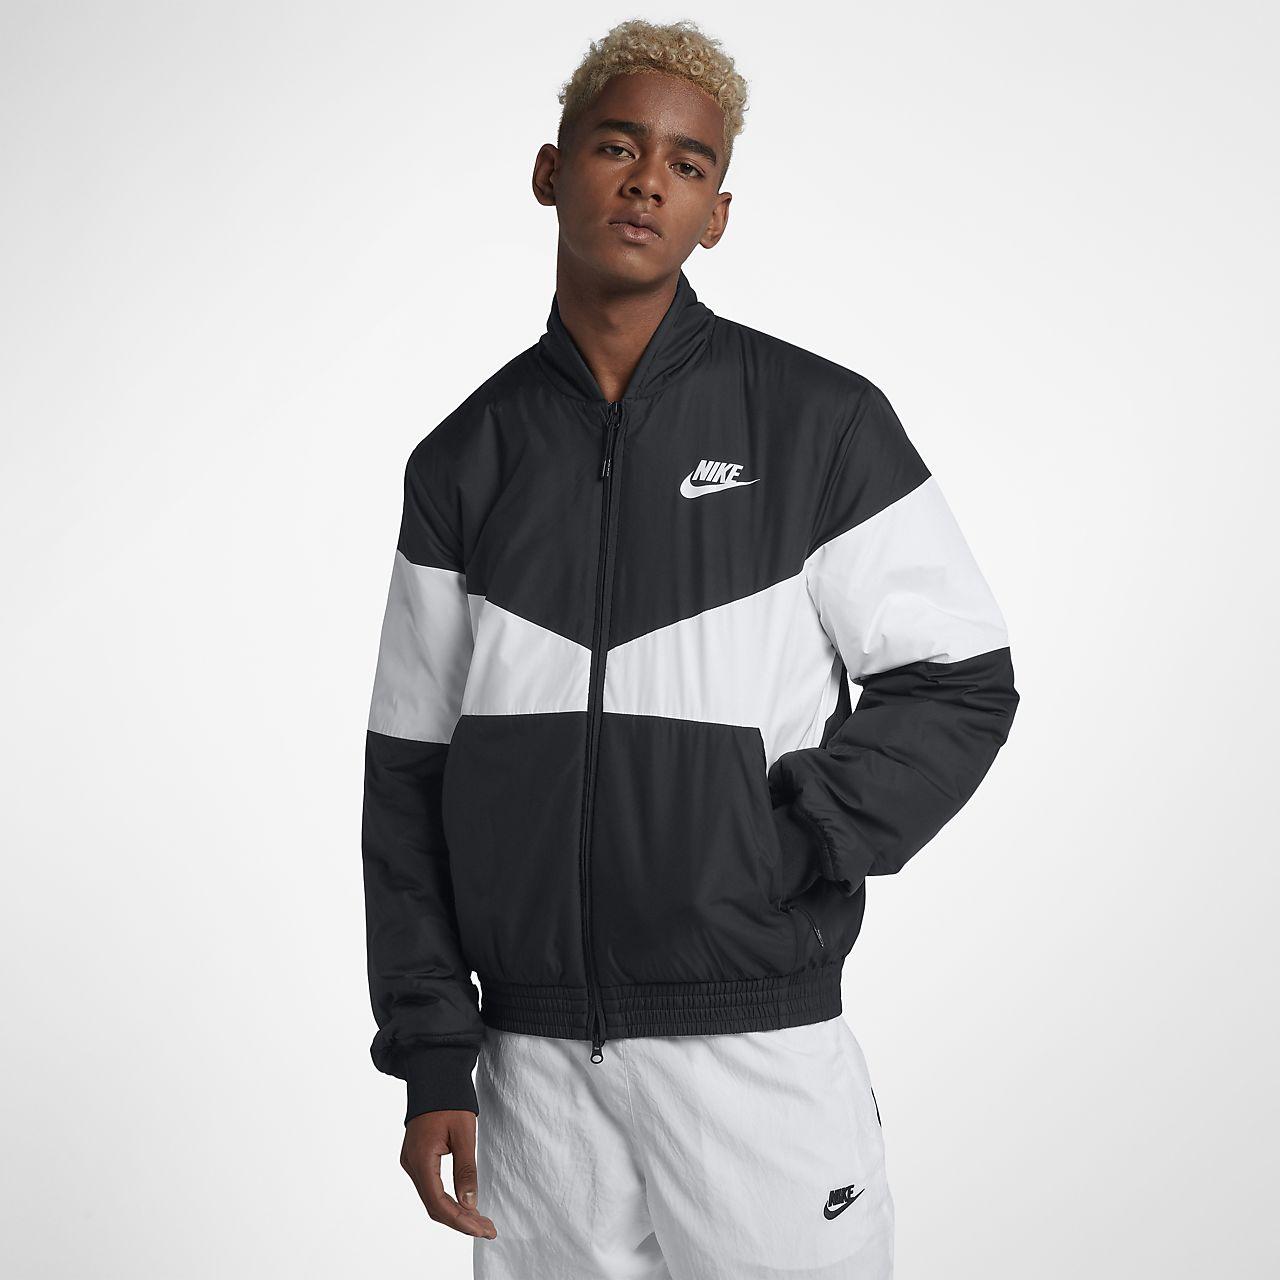 Motifs Aviateur Synthetic Sportswear Veste Fill Nike Homme À Pour yb76fg